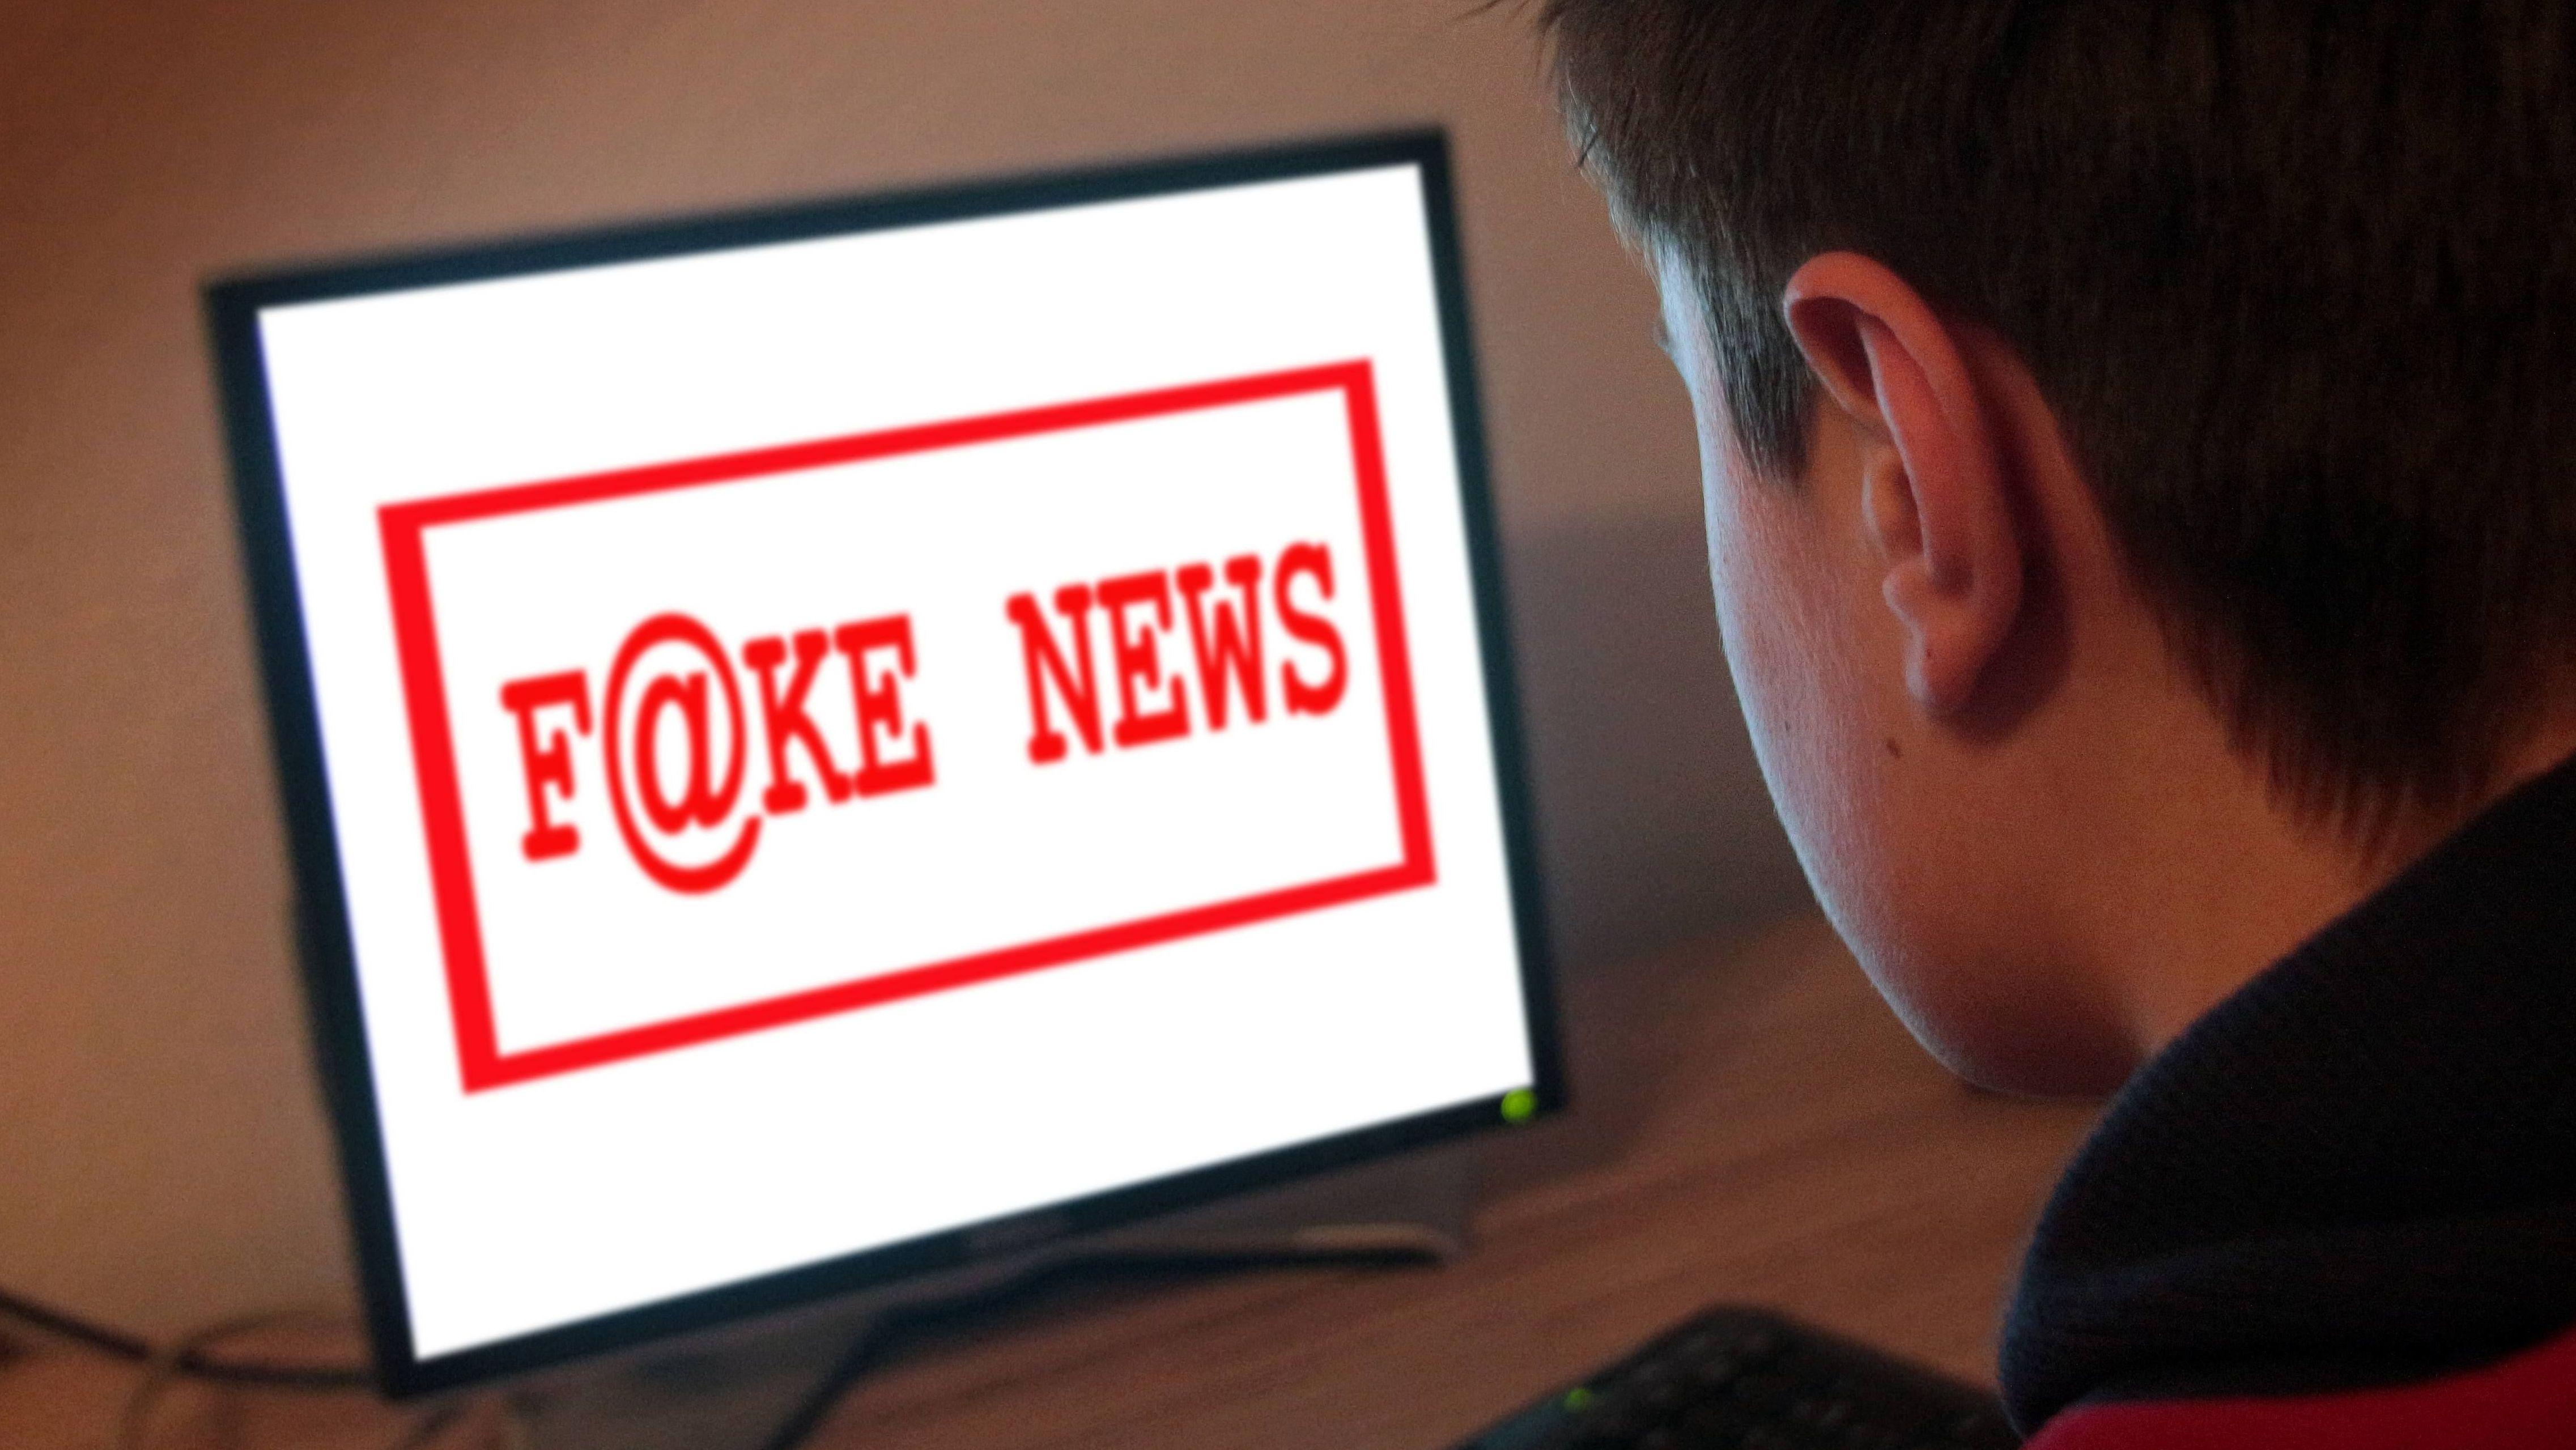 Fake-News im Netz: Oft stecken Computer-Programme dahinter